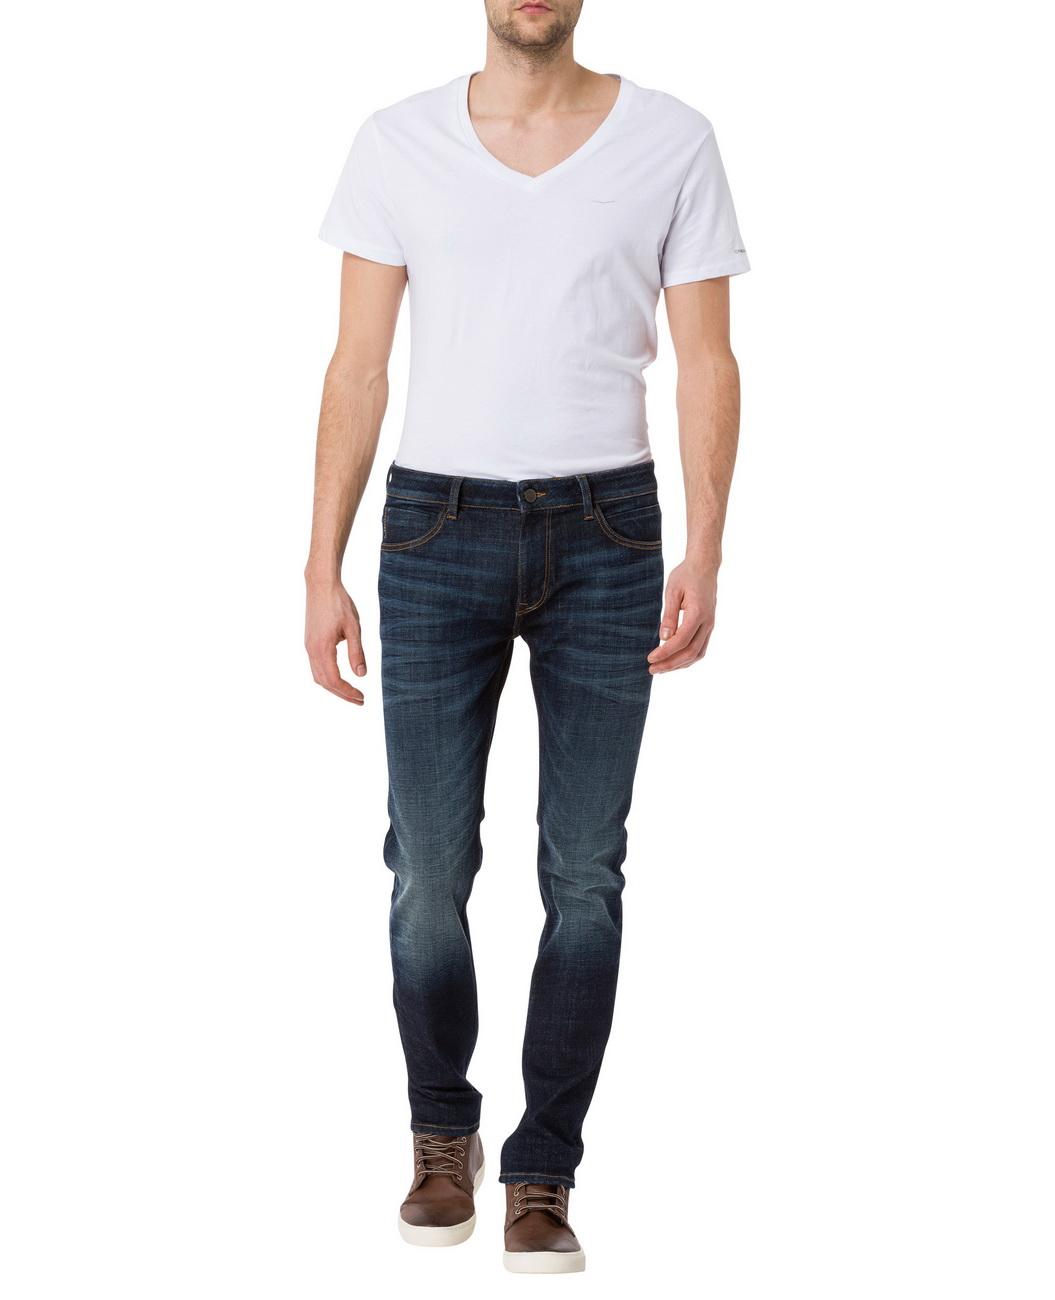 cross jeans herren jeans johnny slim fit blau deep blue kaufen jeans direct de. Black Bedroom Furniture Sets. Home Design Ideas